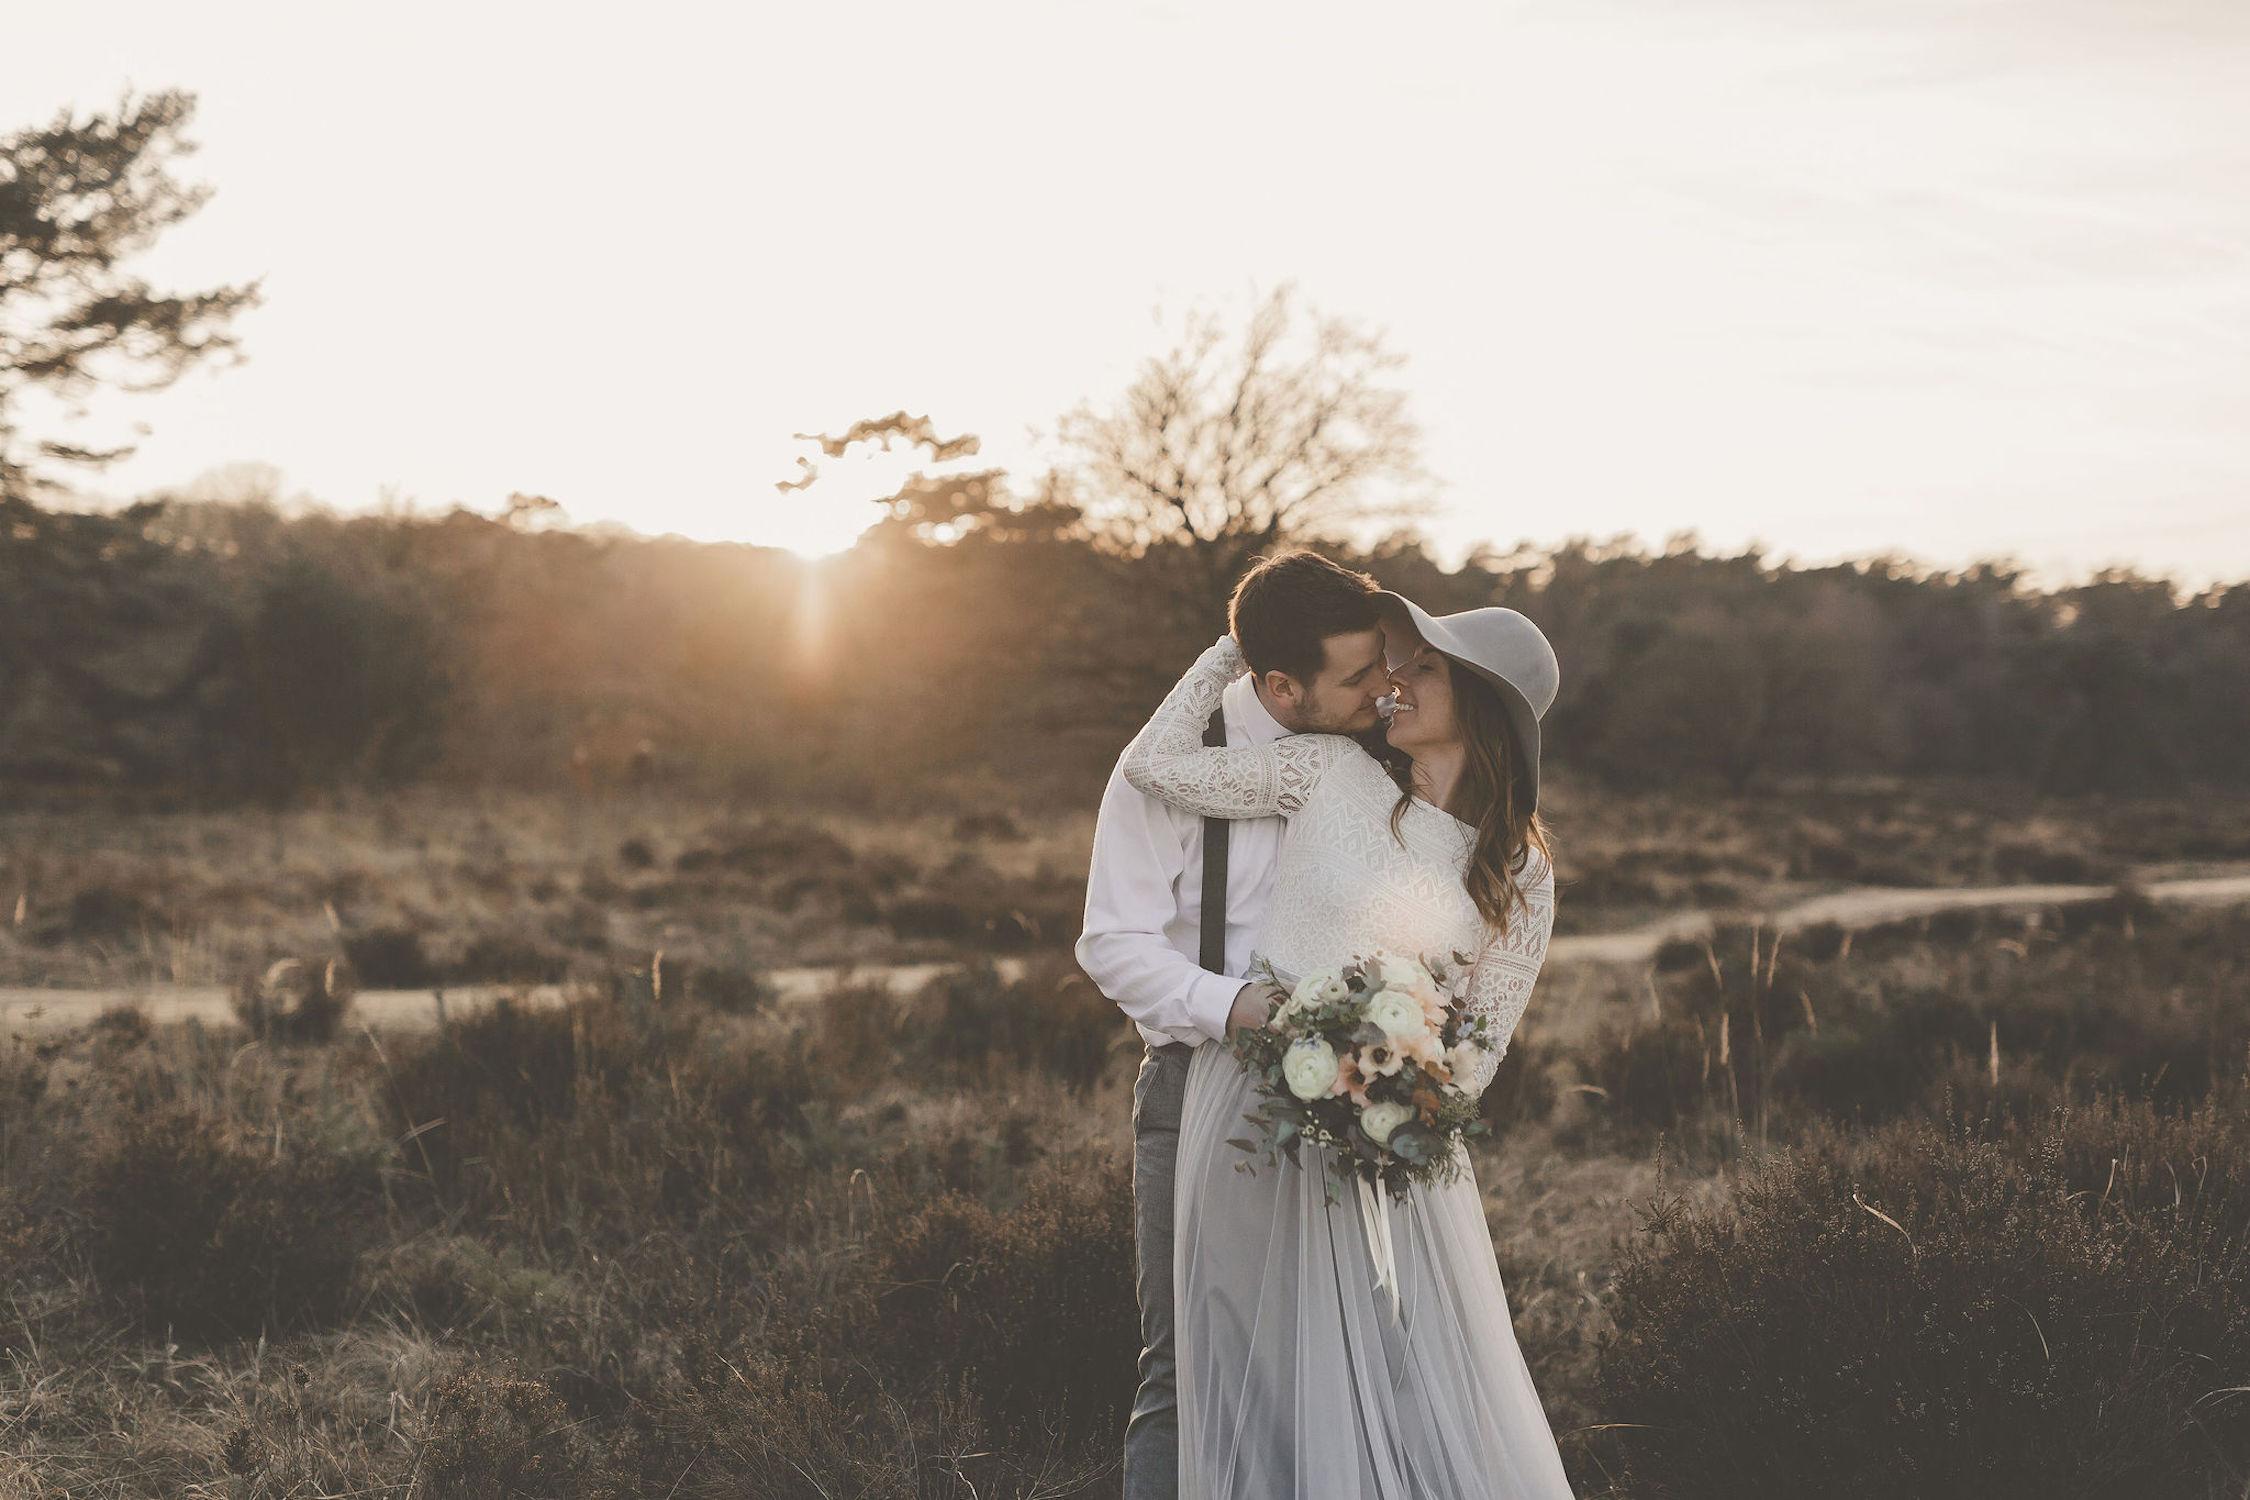 Boho Brautkleid mit Tüllrock in Grau